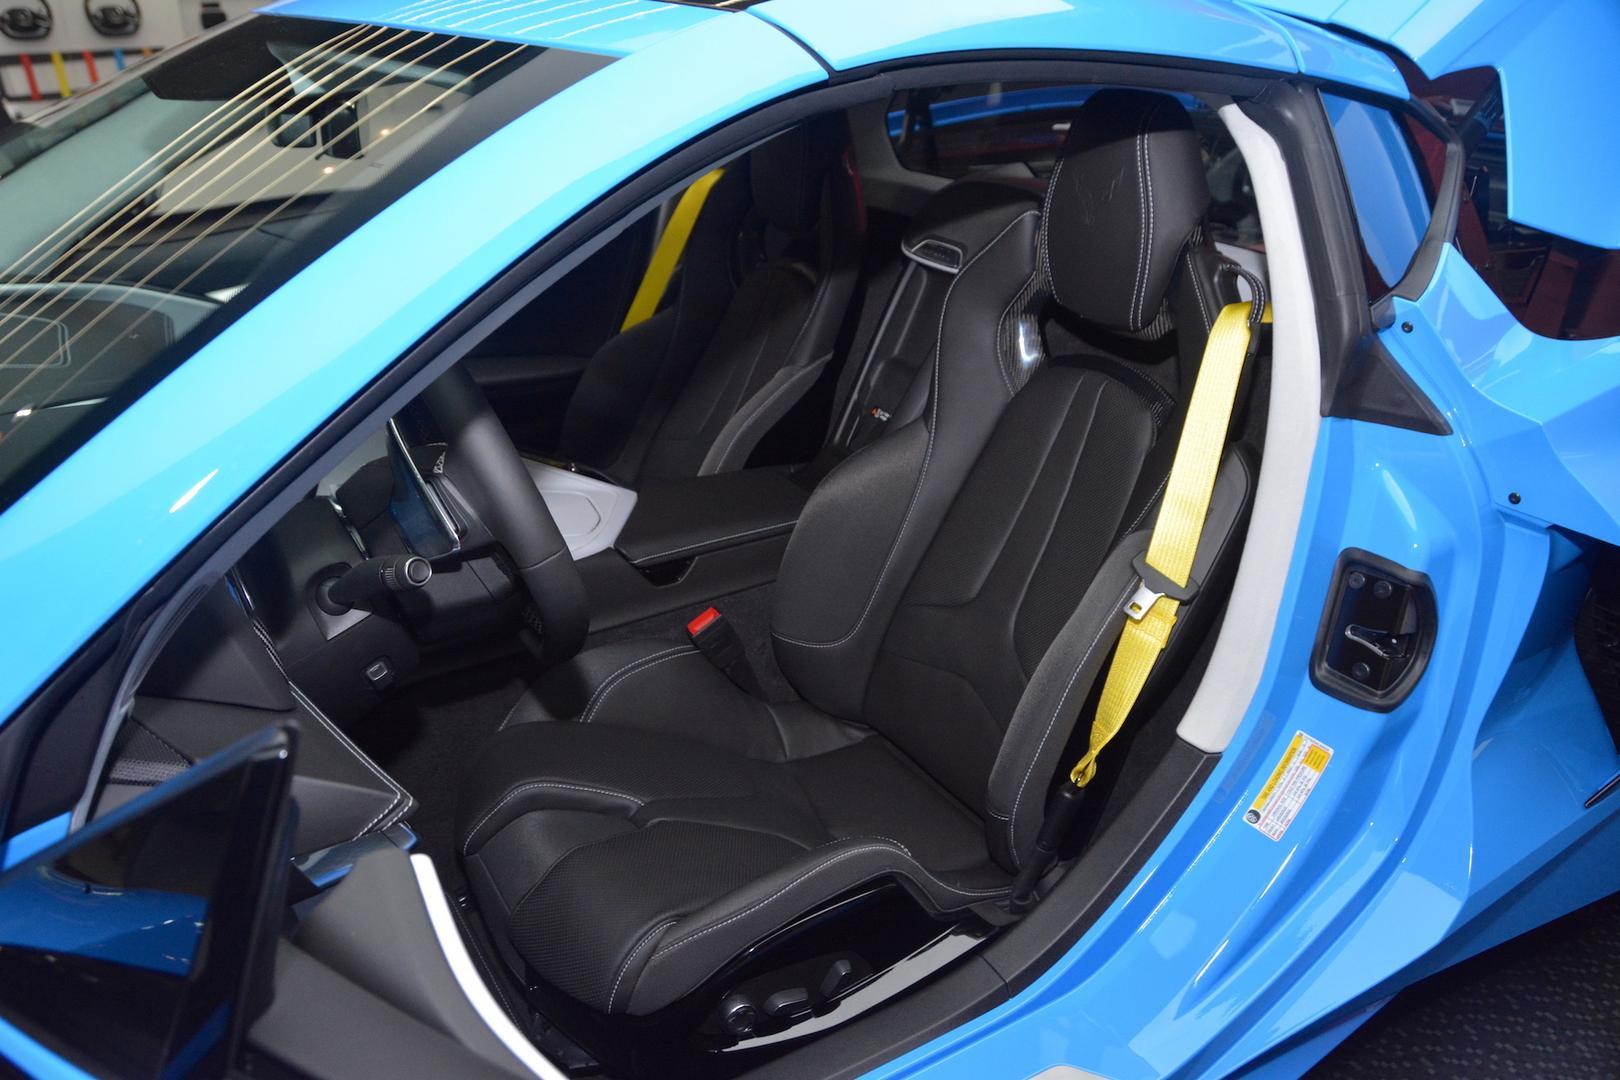 2020 Corvette C8 Seats